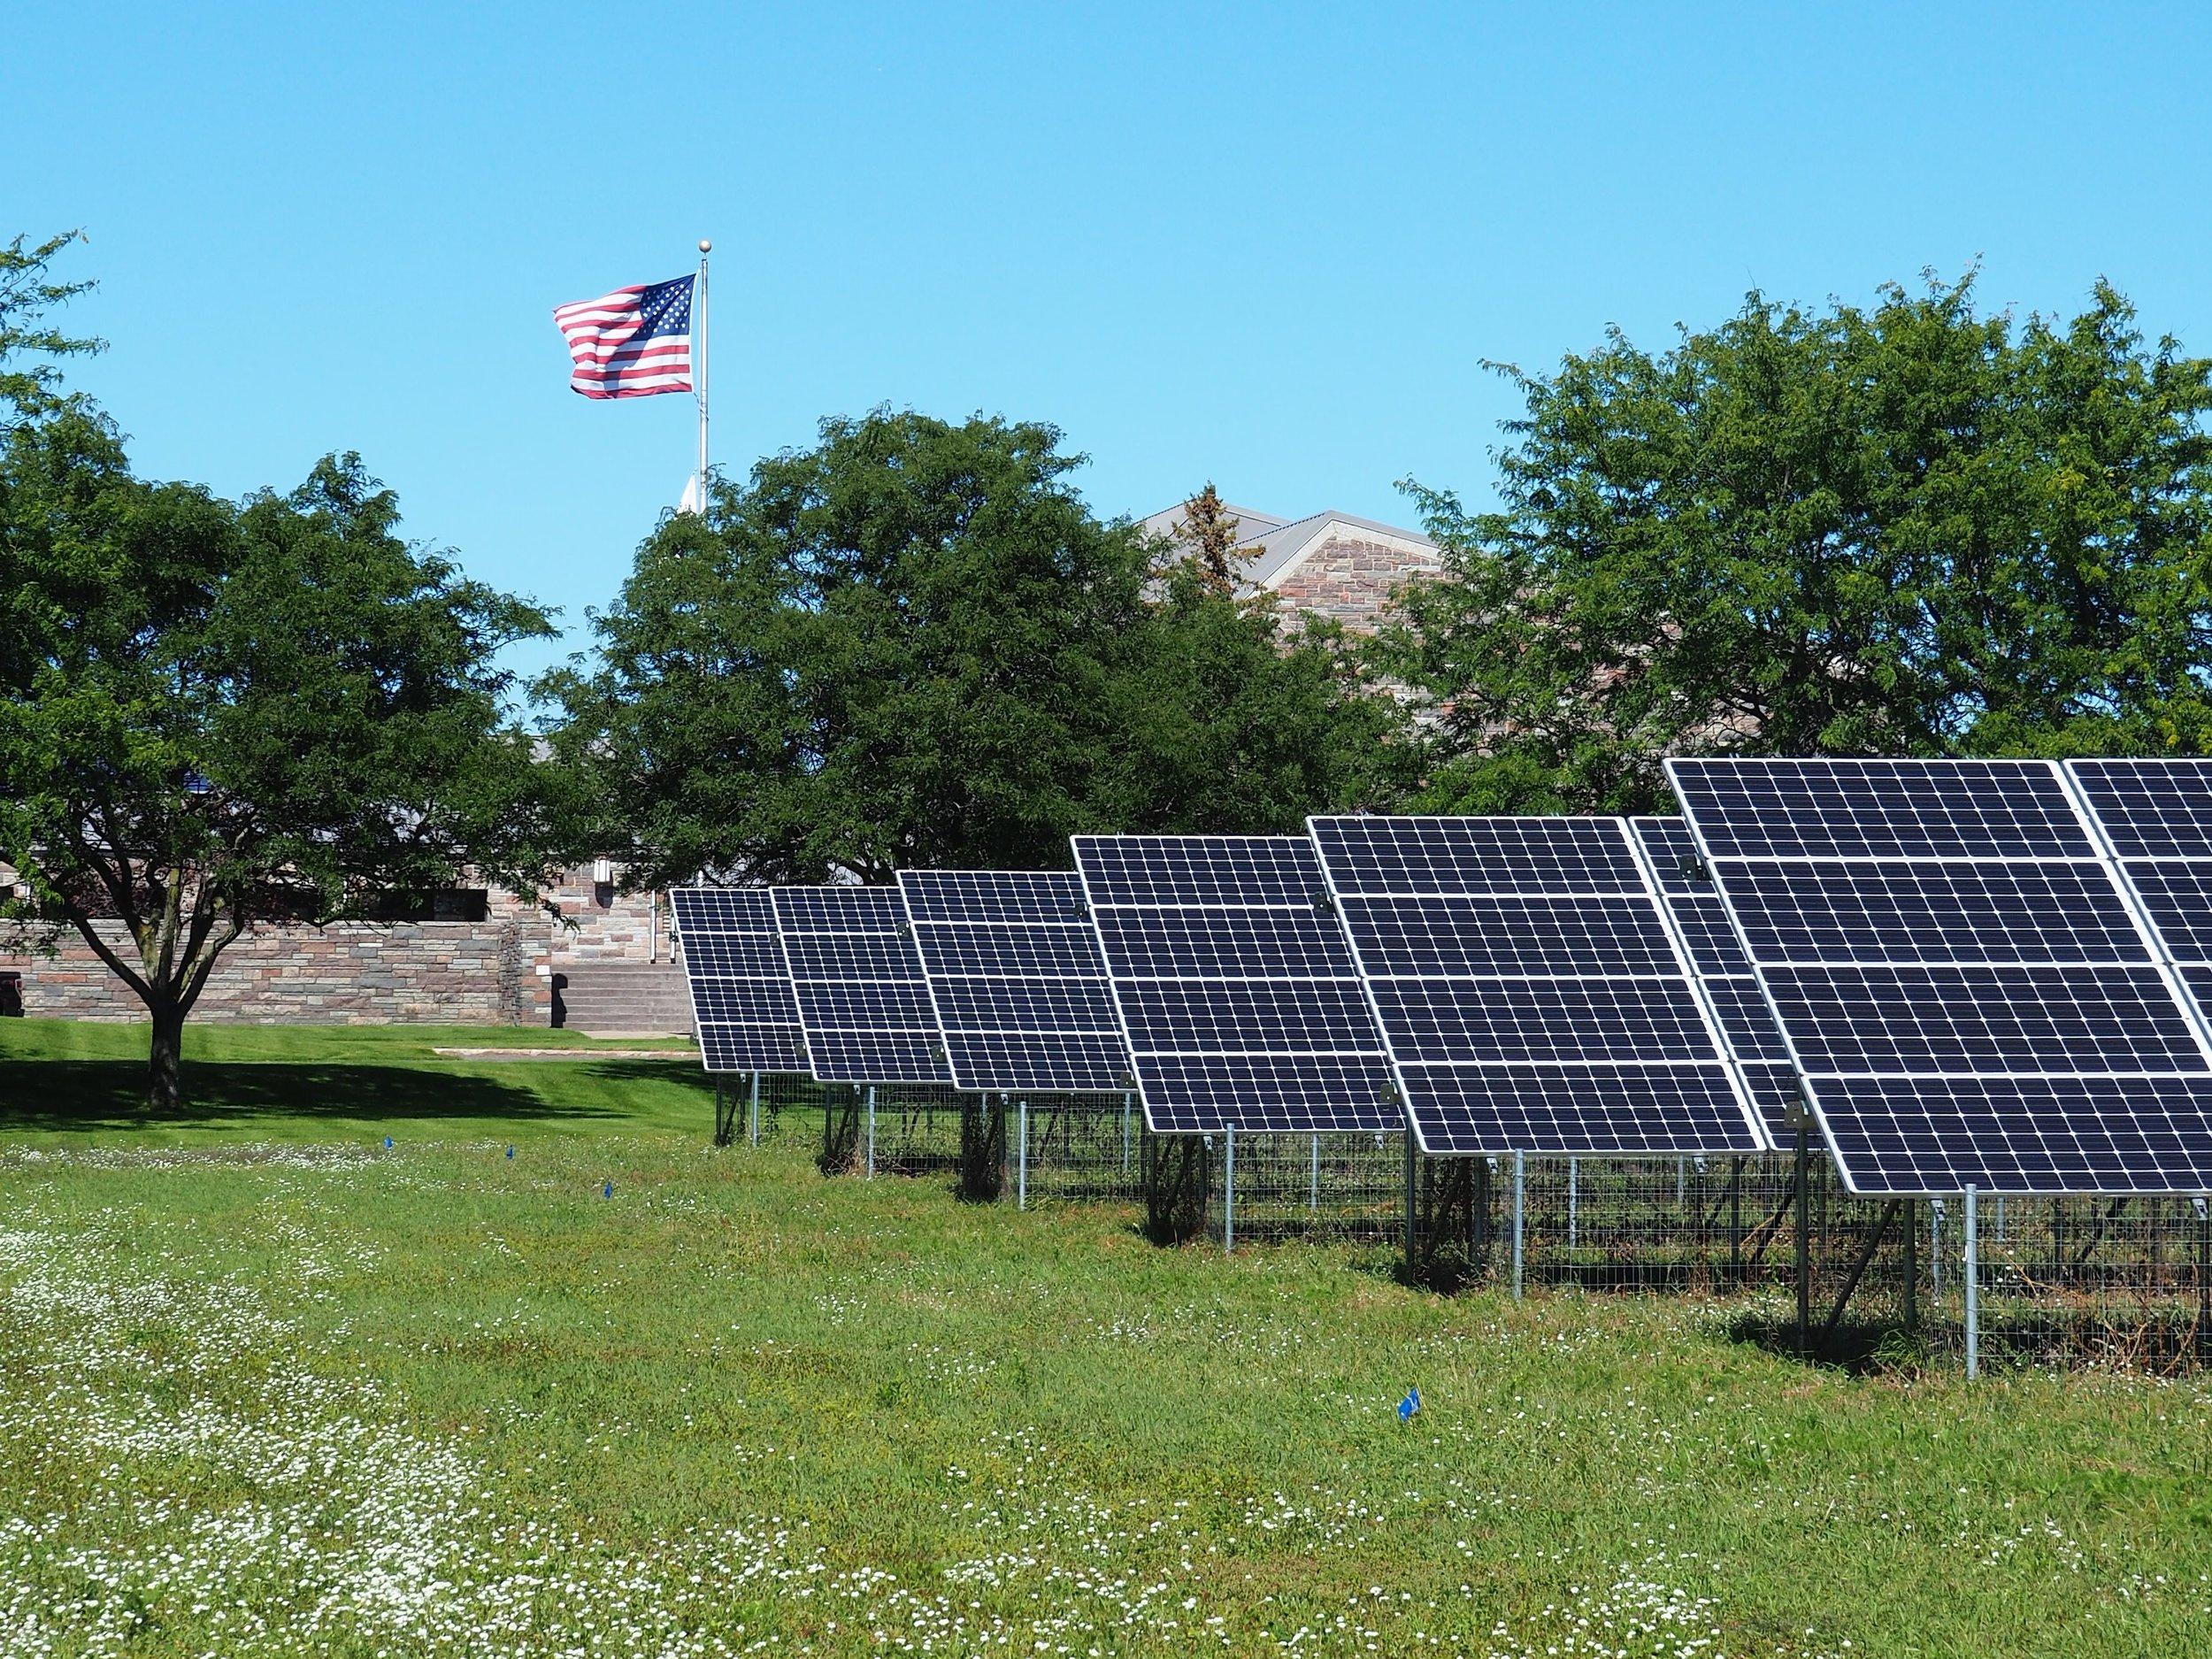 solar-panels-renewable-energy-project.jpg